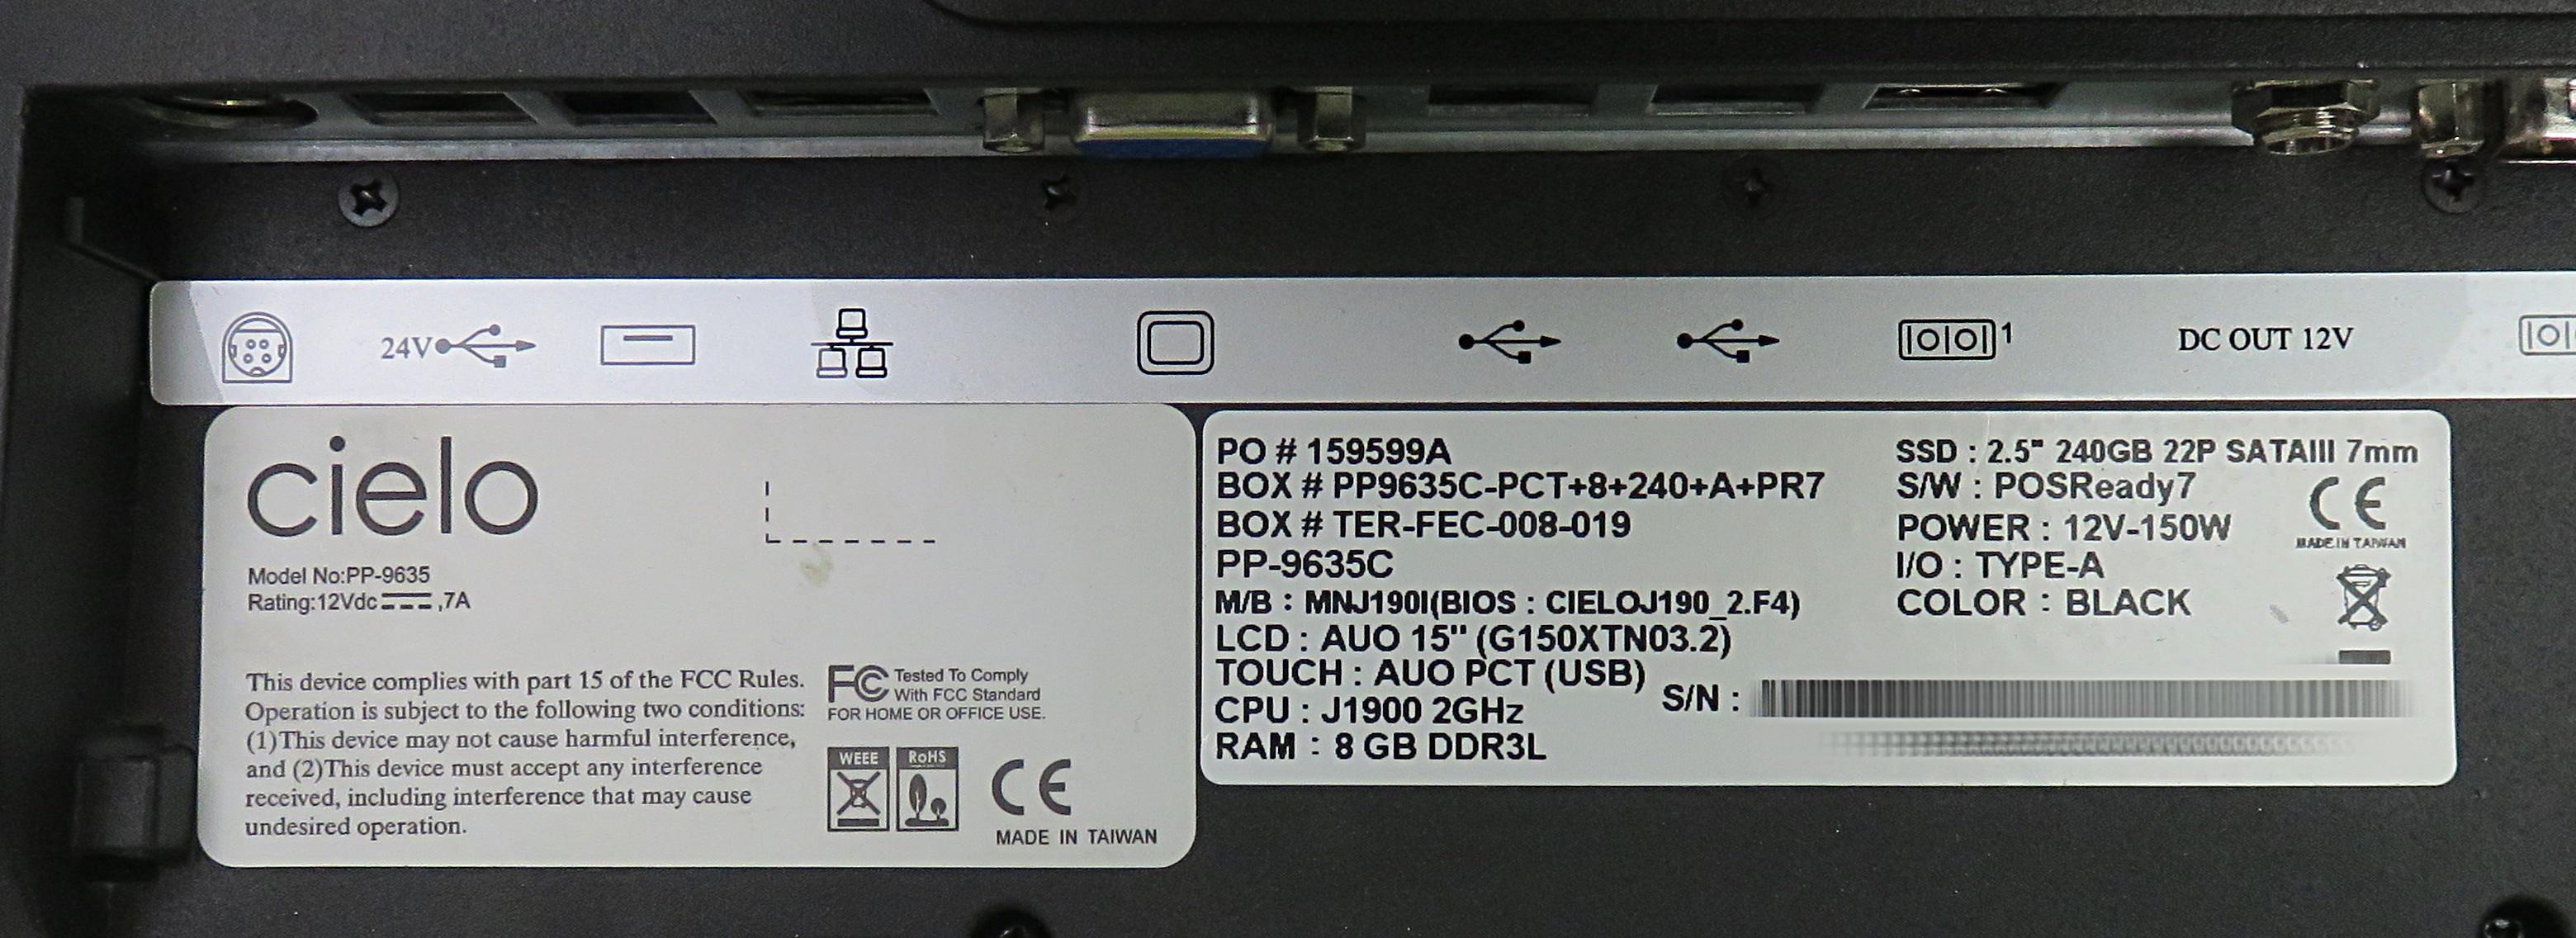 Cielo PP-9635C EPOS Terminal w/ Touchscreen & Customer Display Panel